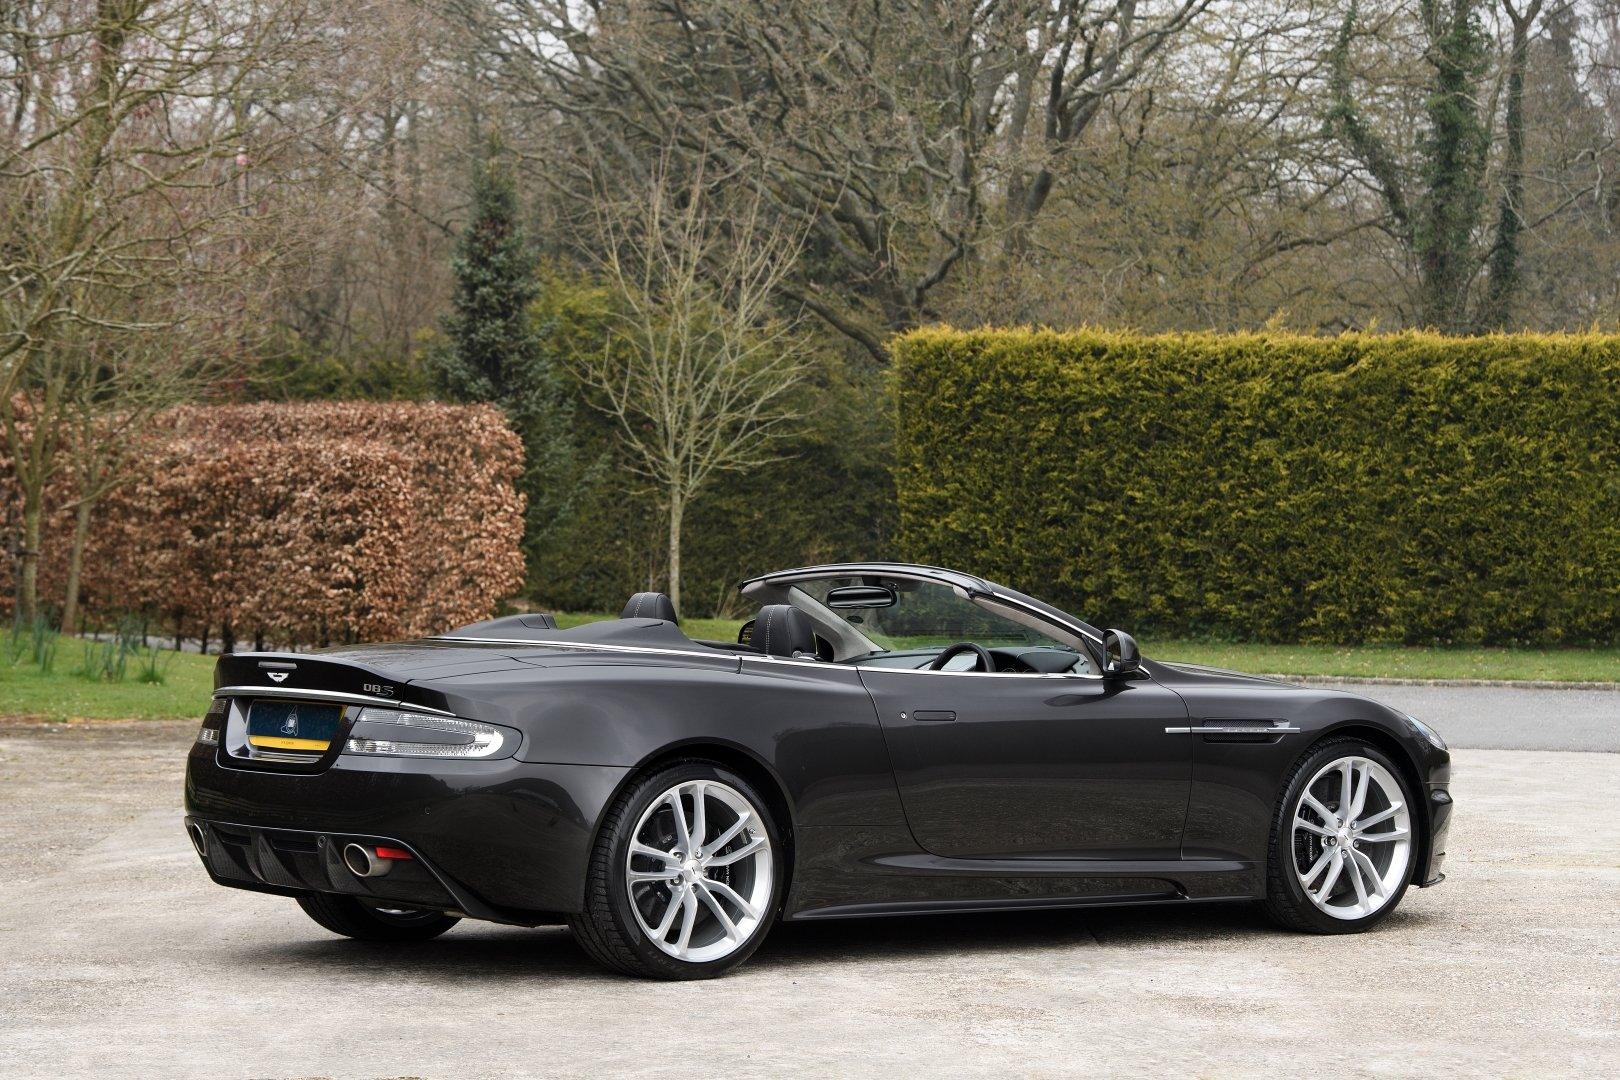 2011 Aston Martin DBS Volante  For Sale (picture 2 of 6)